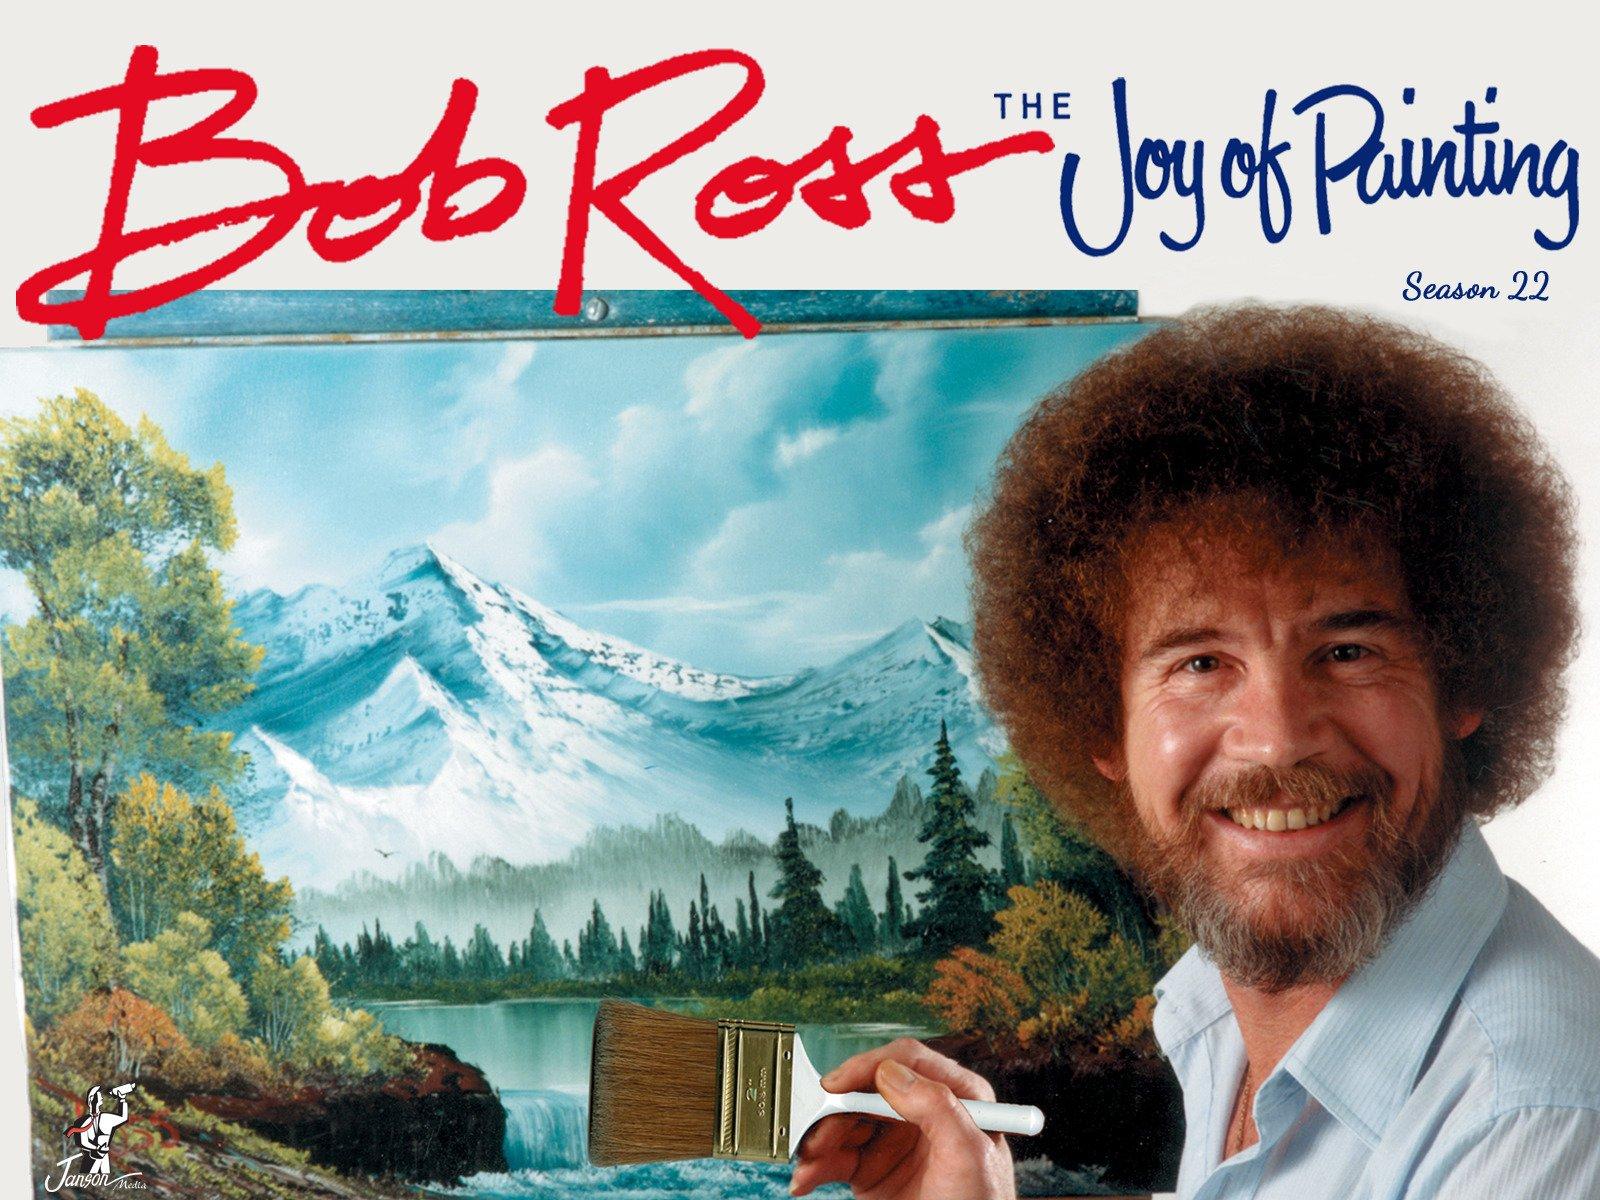 Bob Ross: The Joy of Painting - Season 22